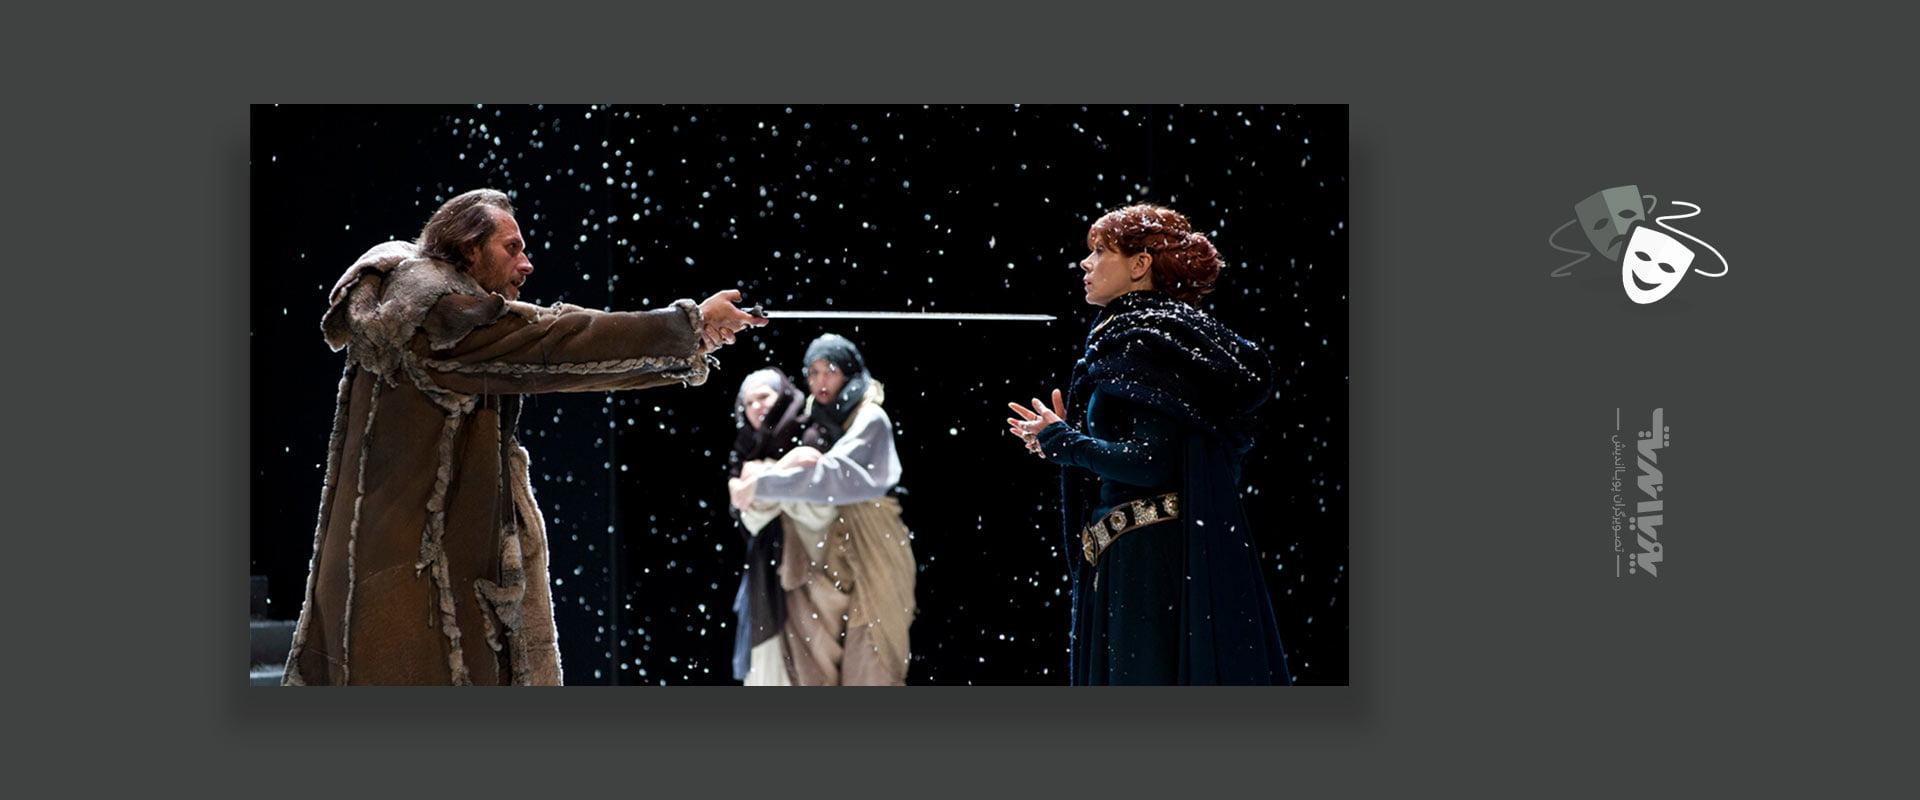 theatre photography 1 - نکات مهم برای عکاسی از تئاتر